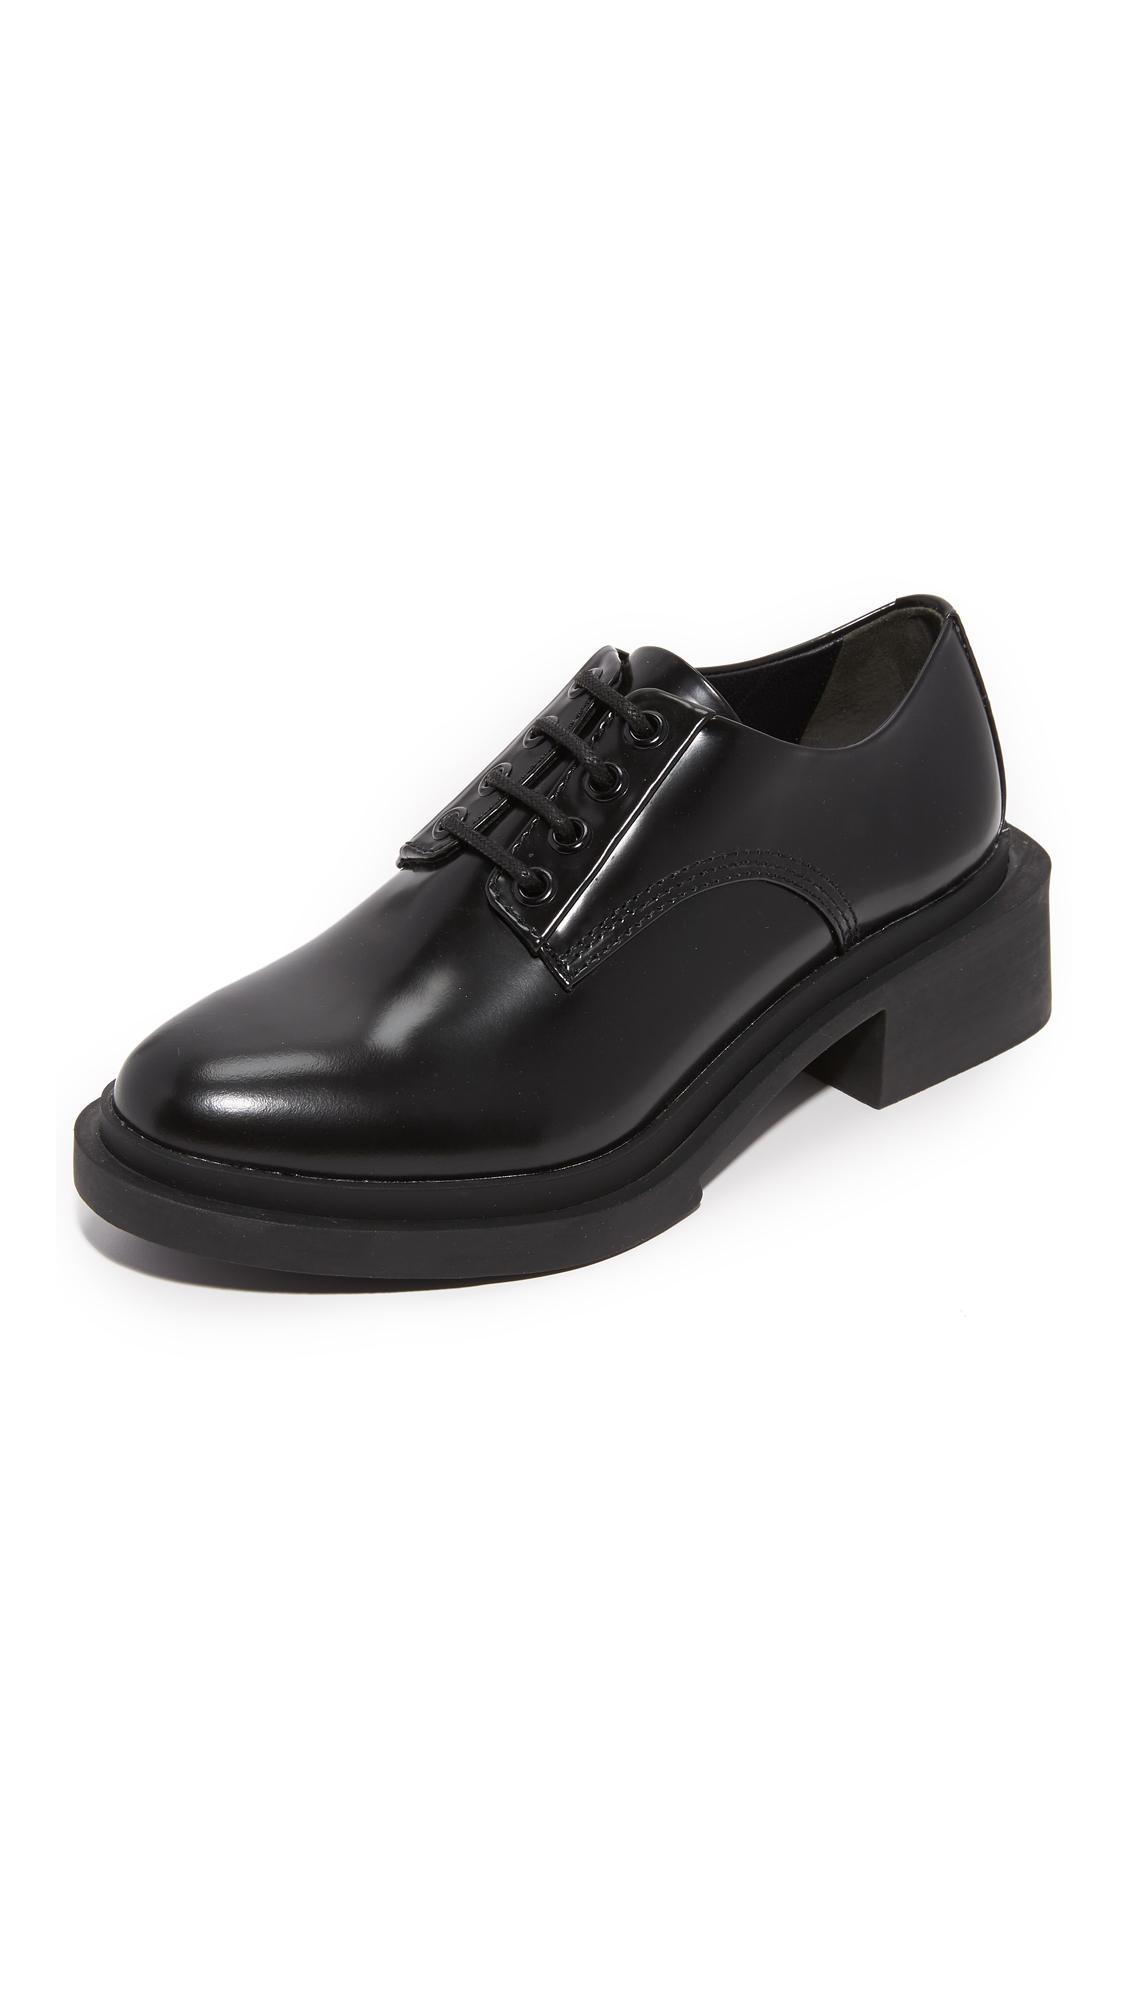 Dkny Alix Oxfords - Black at Shopbop